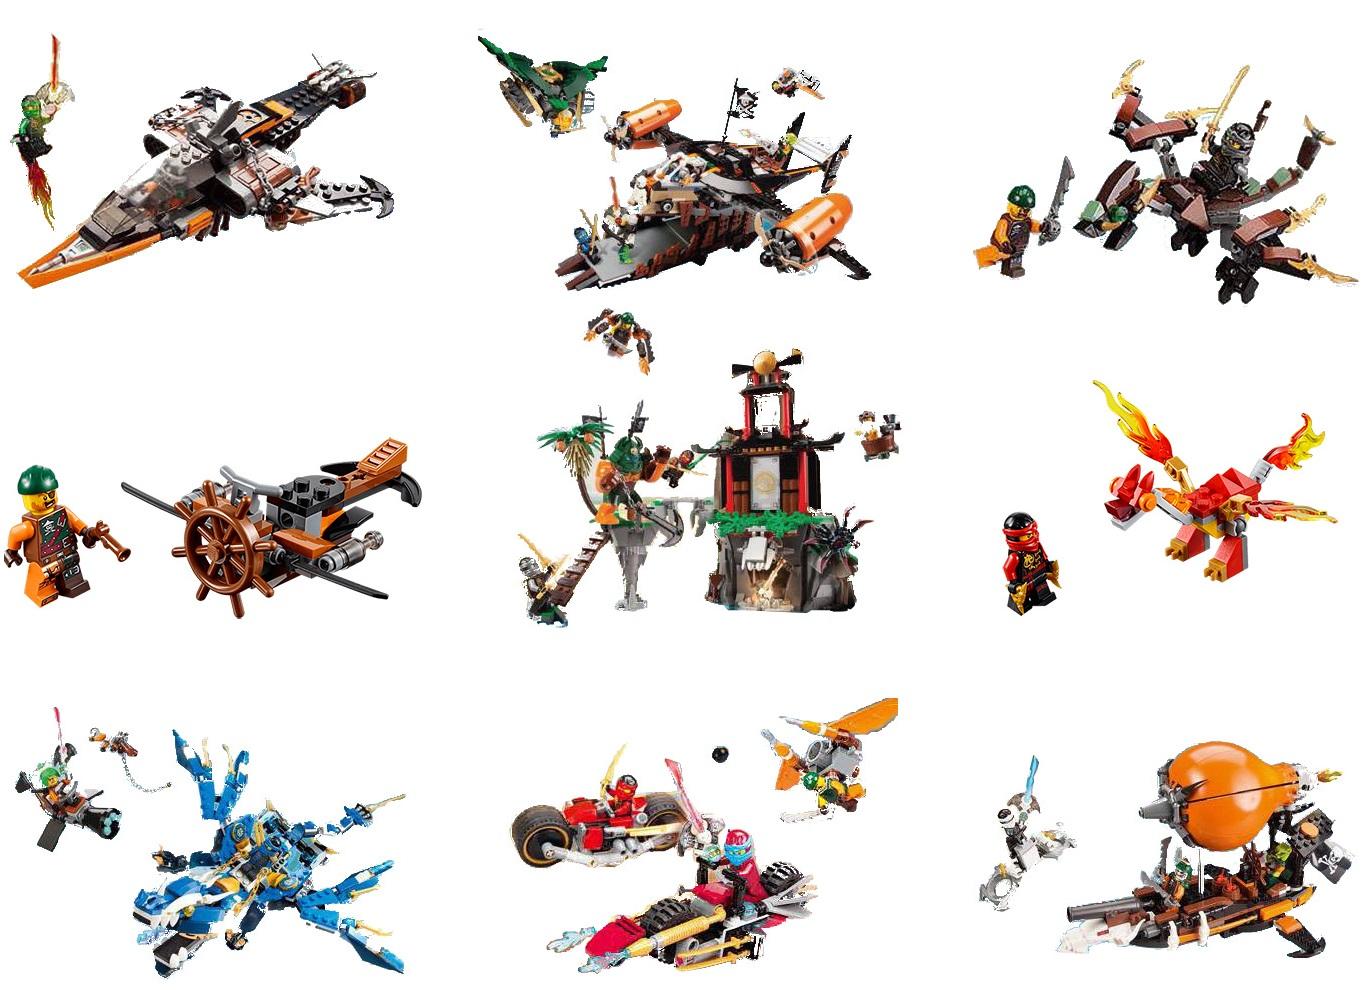 Lego ninja blog lego ninjago sezon 7 - Lego ninjago 6 ...